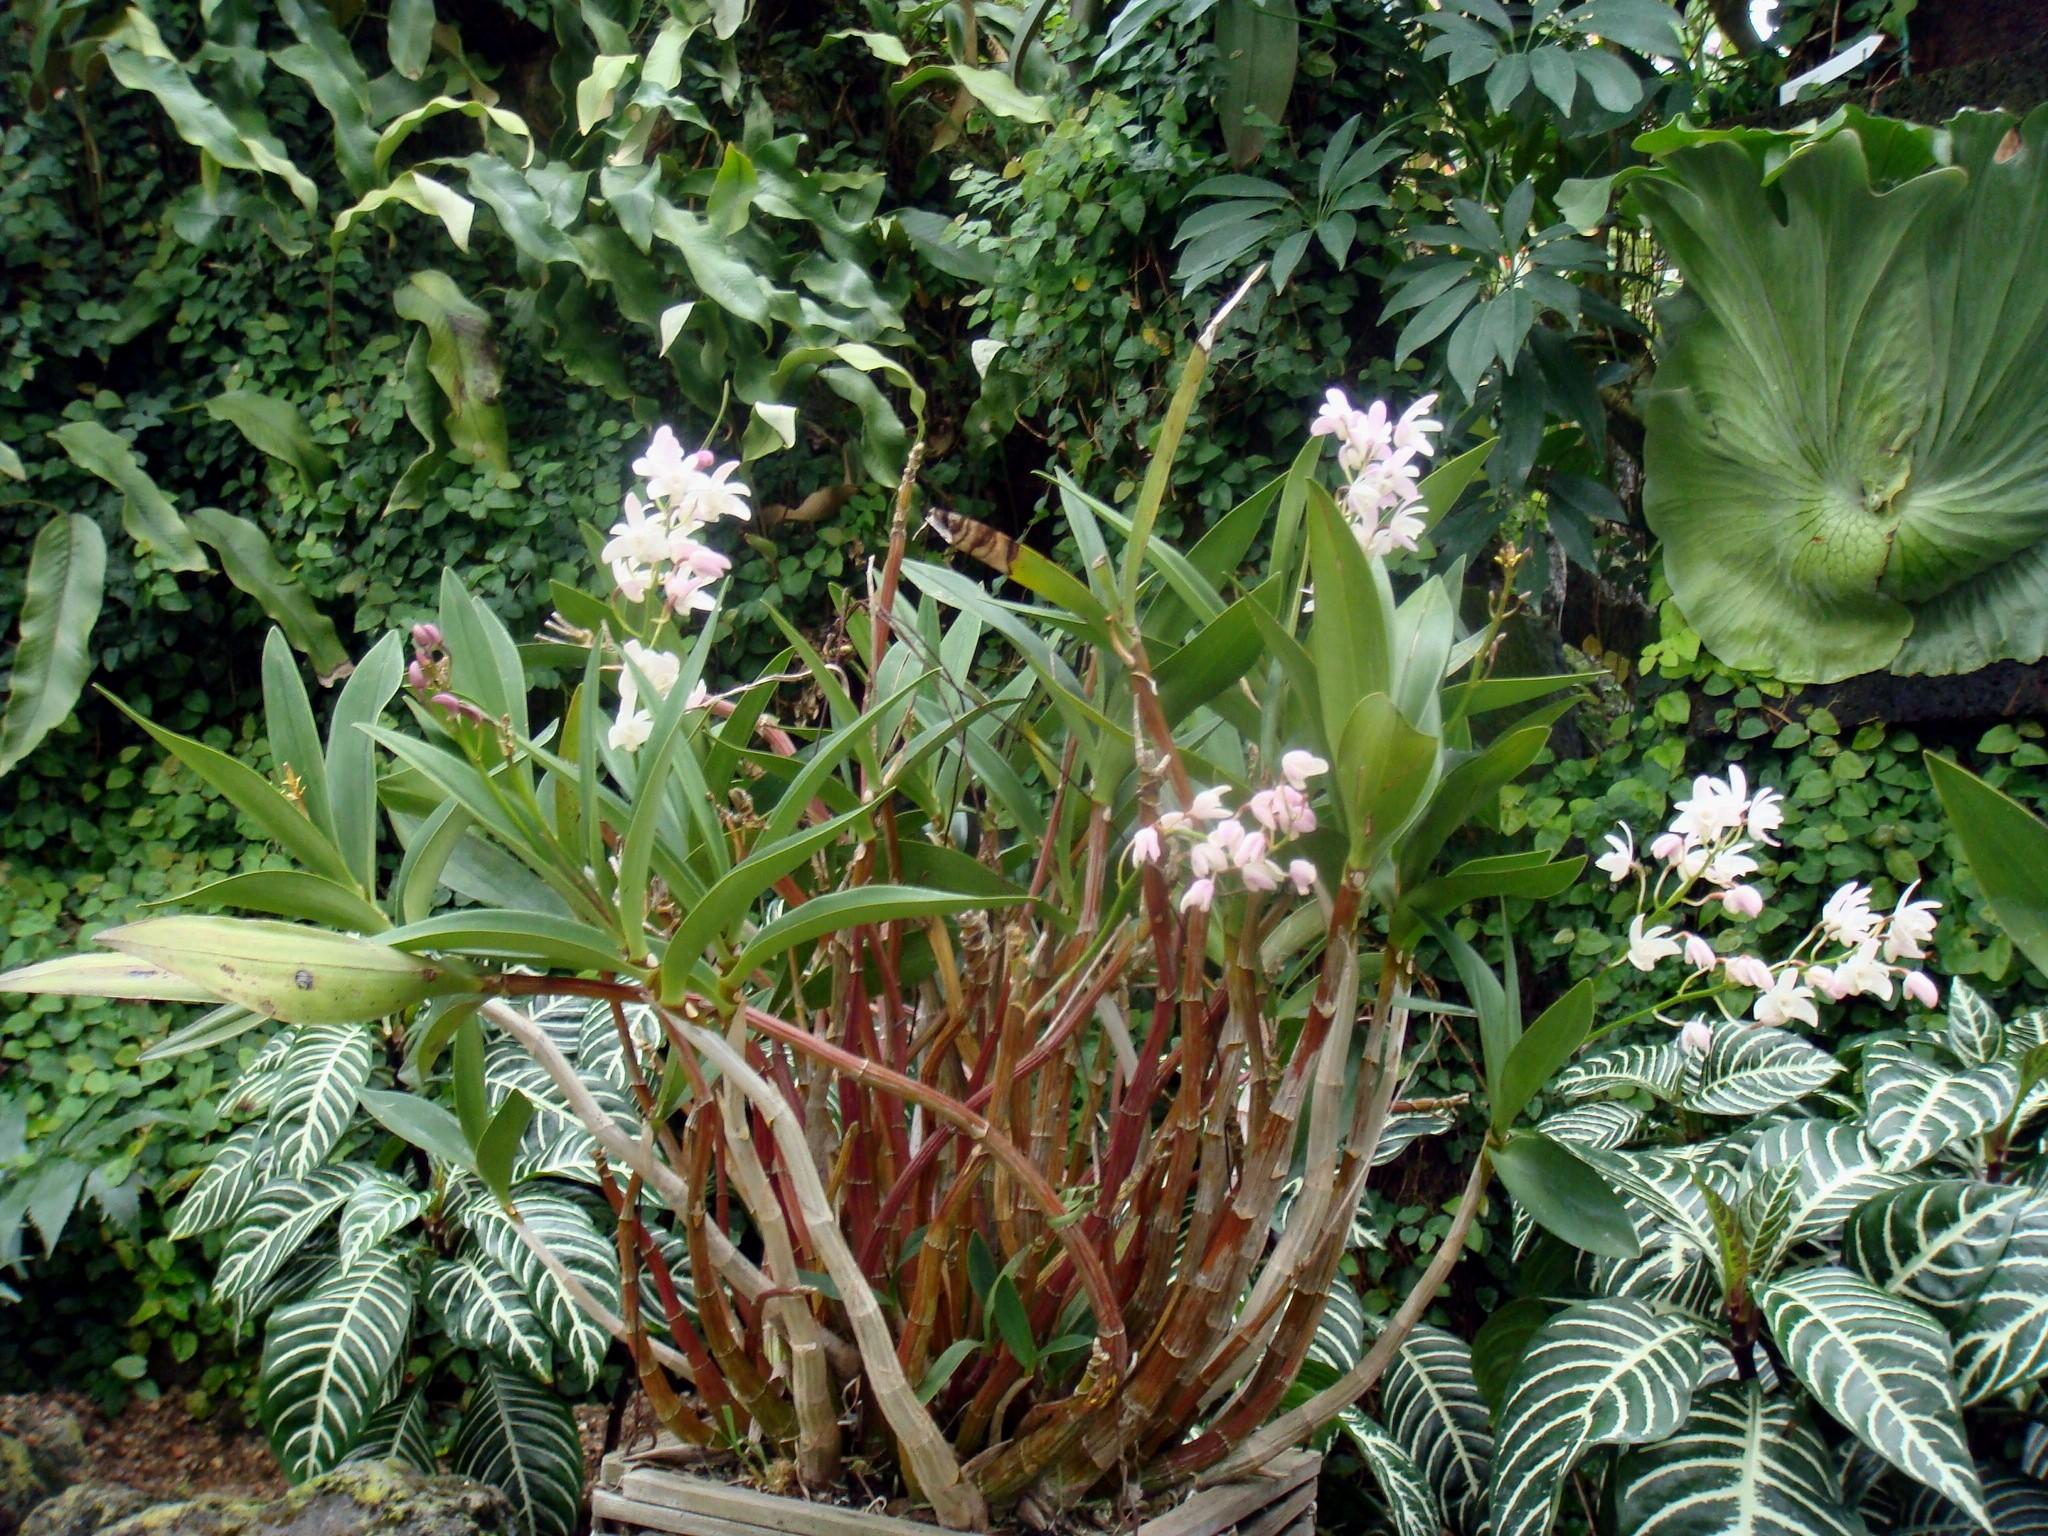 http://orchids.la.coocan.jp/Dendrobium/Dendrobium%20kingianum/DSC07410.JPG